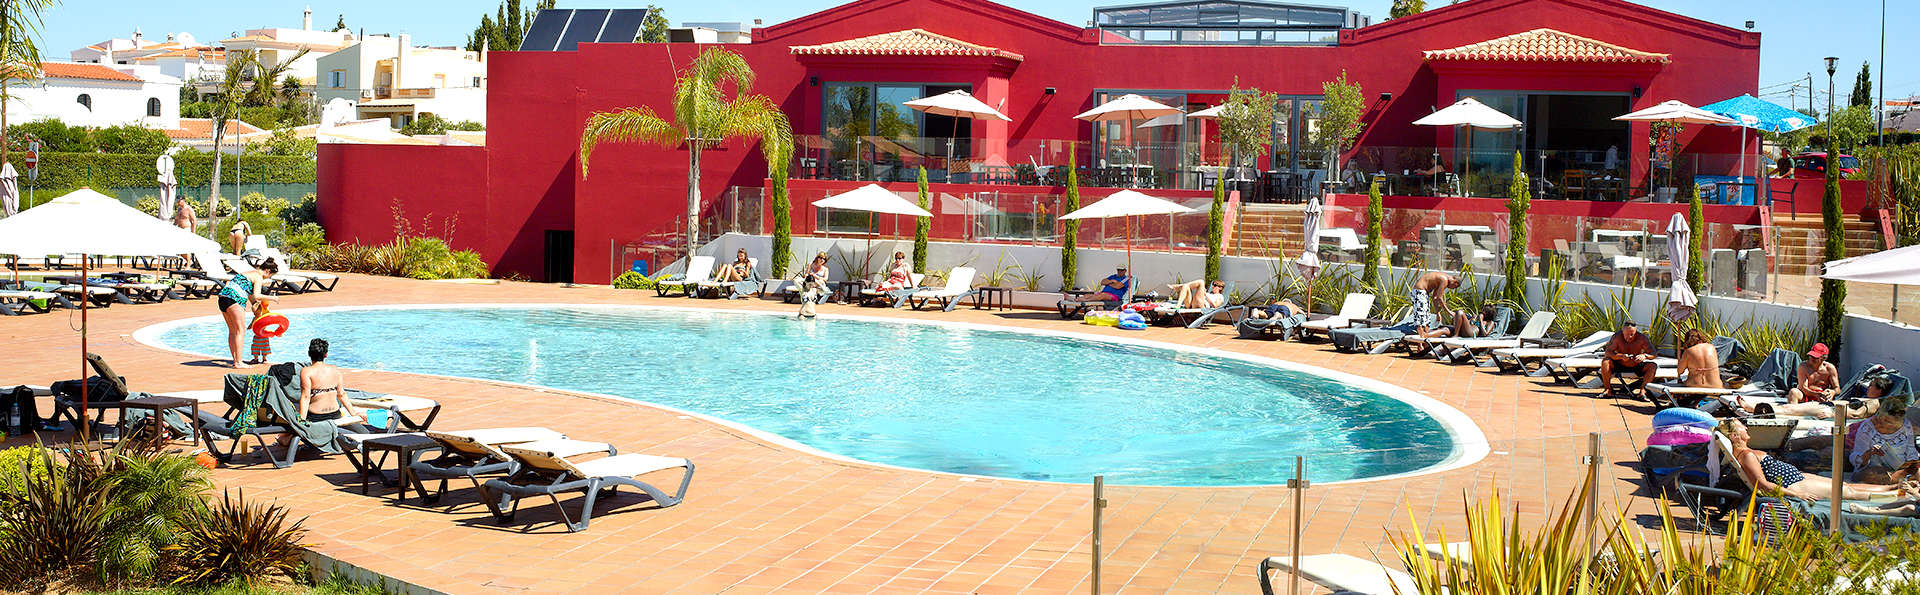 Agua Hotels Vale da Lapa - EDIT_NEW_POOL2.jpg